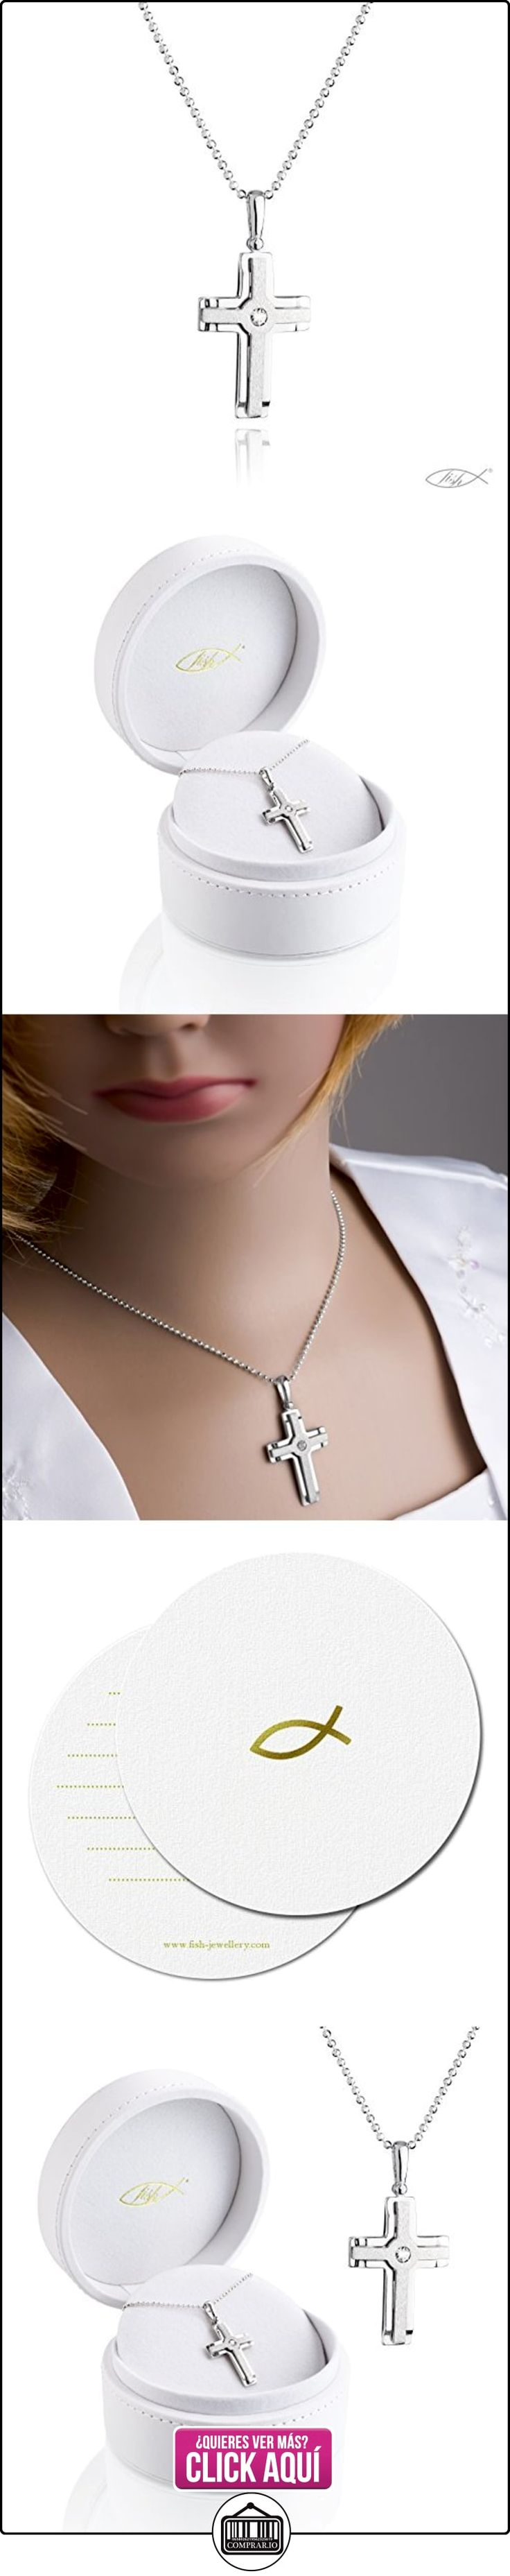 fish collar de plata para chicos, chicas, plata de ley 925 Elementos Swarovski colgante de cruz 42 cm  ✿ Joyas para niñas - Regalos ✿ ▬► Ver oferta: https://comprar.io/goto/B01D36ZEQ2